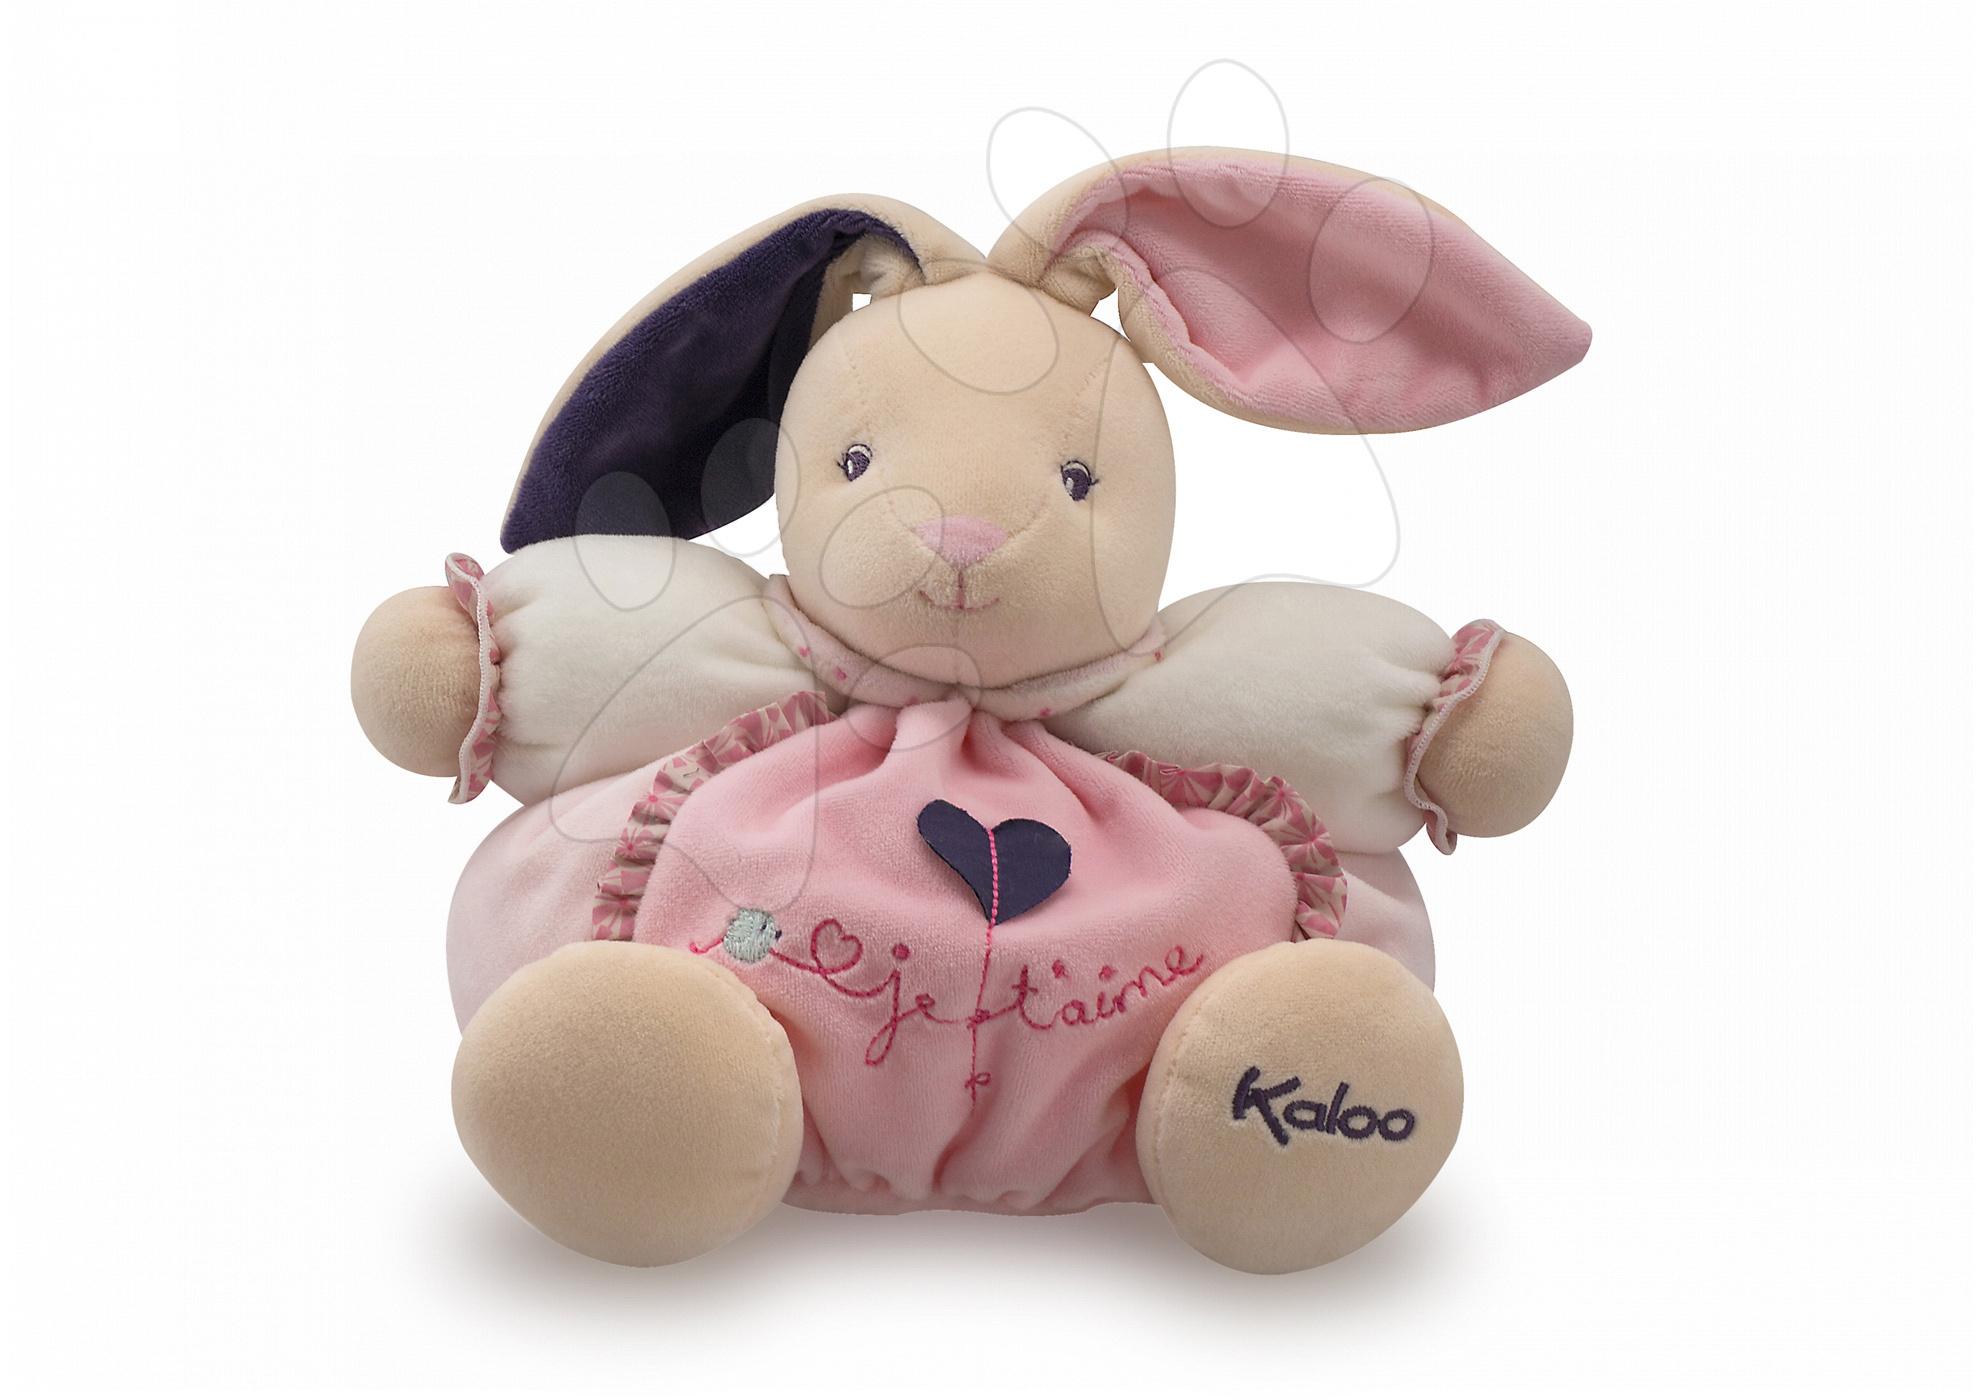 Kaloo plyšový zajko Petite Rose-Chubby Rabbit Love 969859 ružový